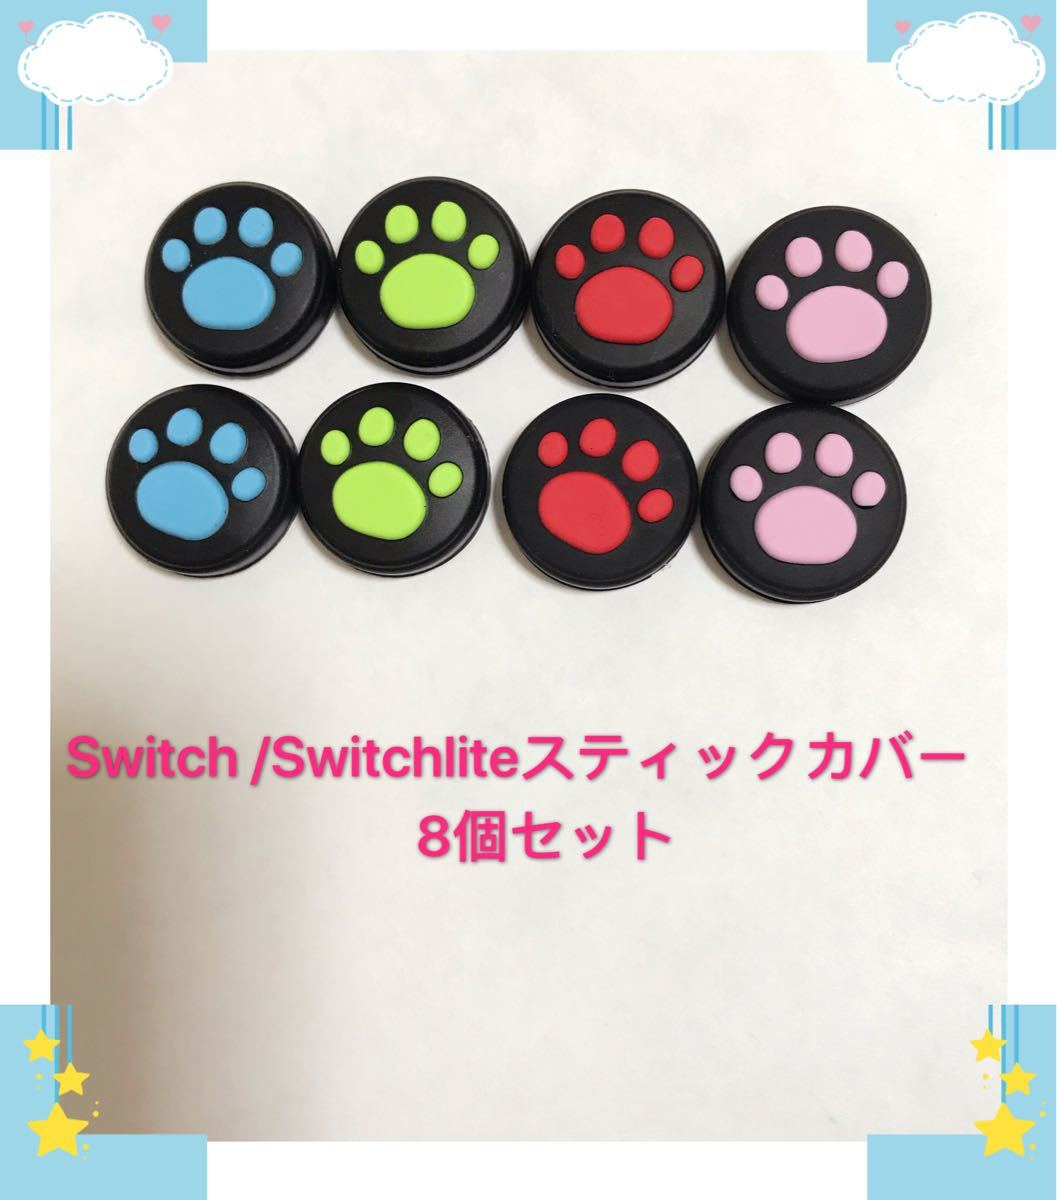 Switch/Switchliteスイッチ ジョイコンスティックカバー 8点